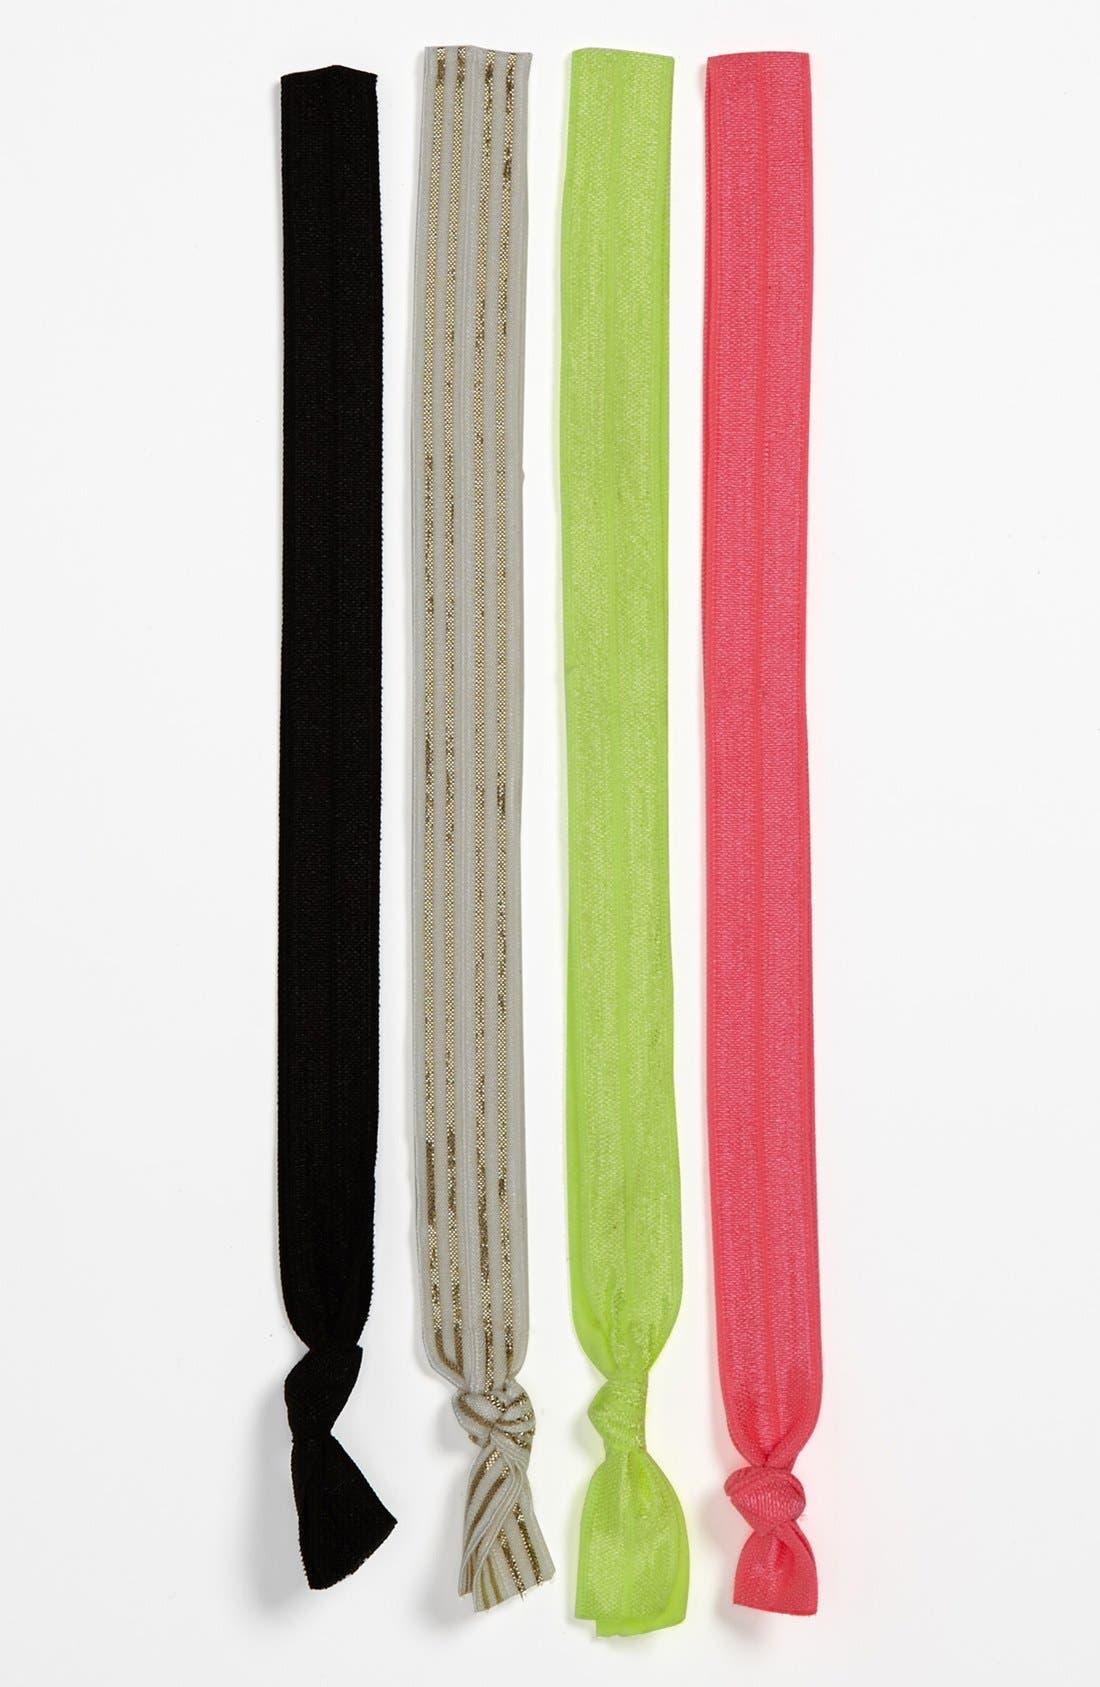 Alternate Image 1 Selected - BP. Stretch Headbands (Set of 4)